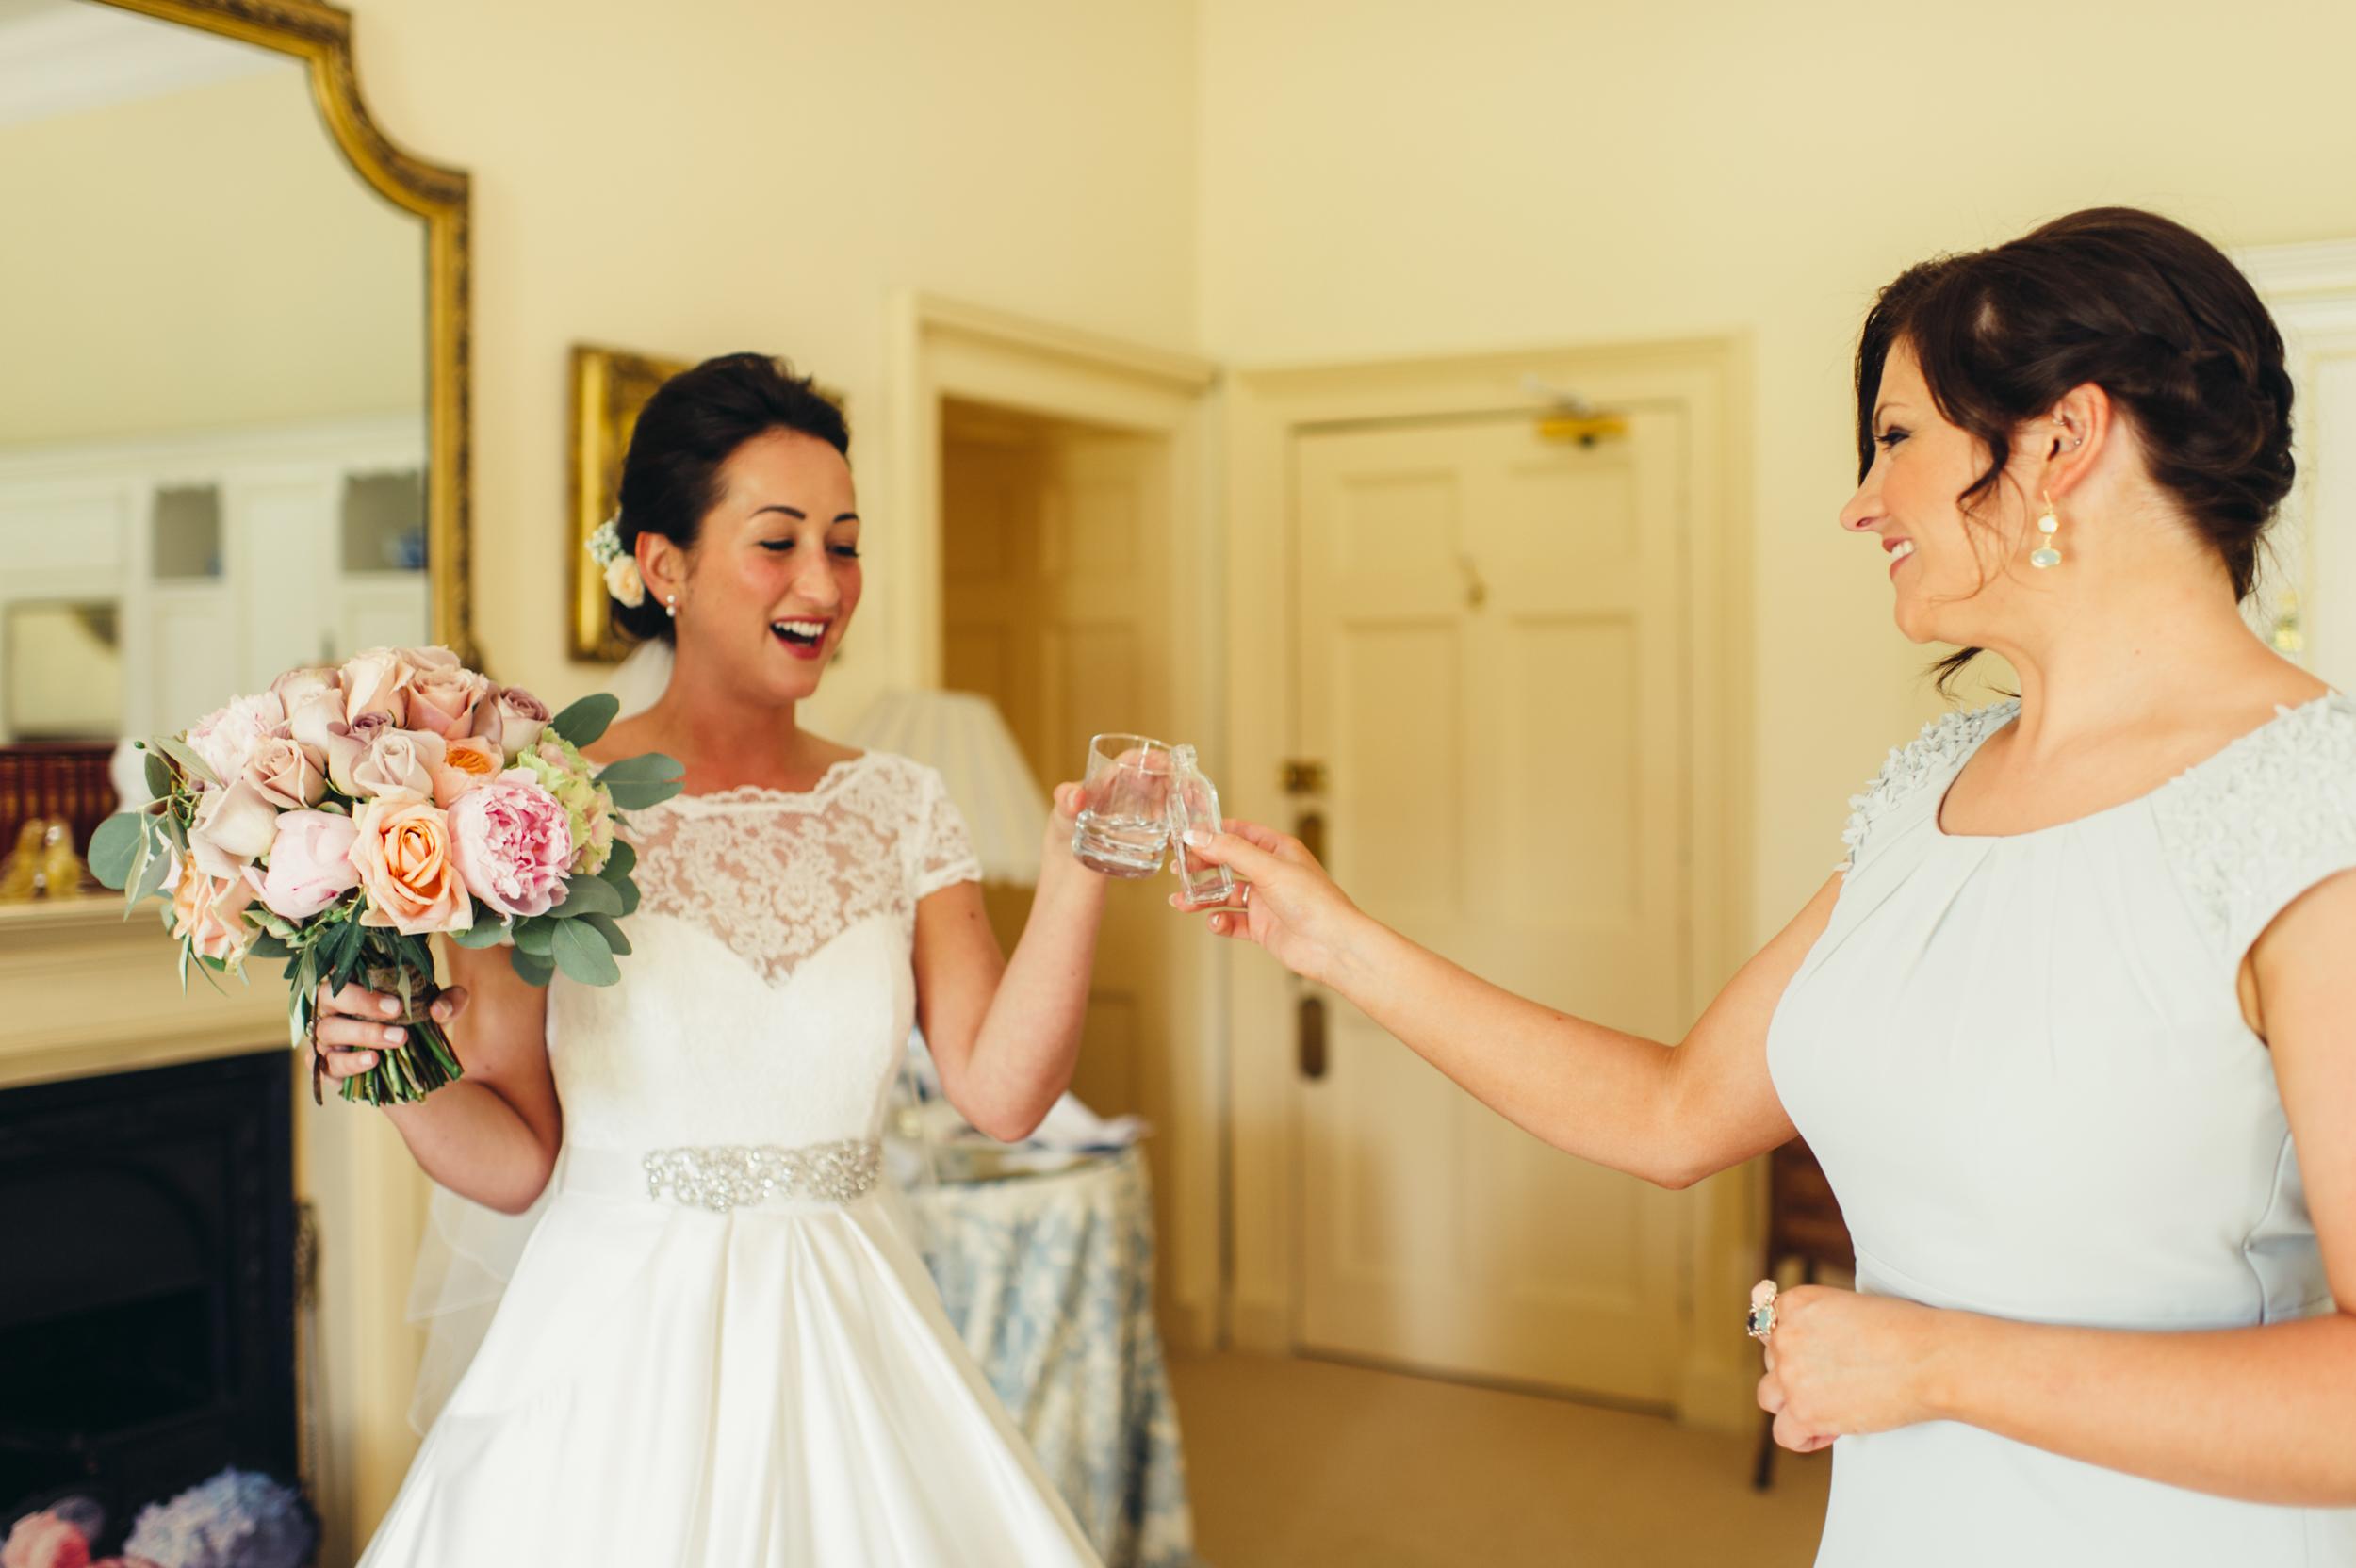 0086-lisa-devine-alternative-creative-wedding-photography-glasgow-edinburgh.JPG